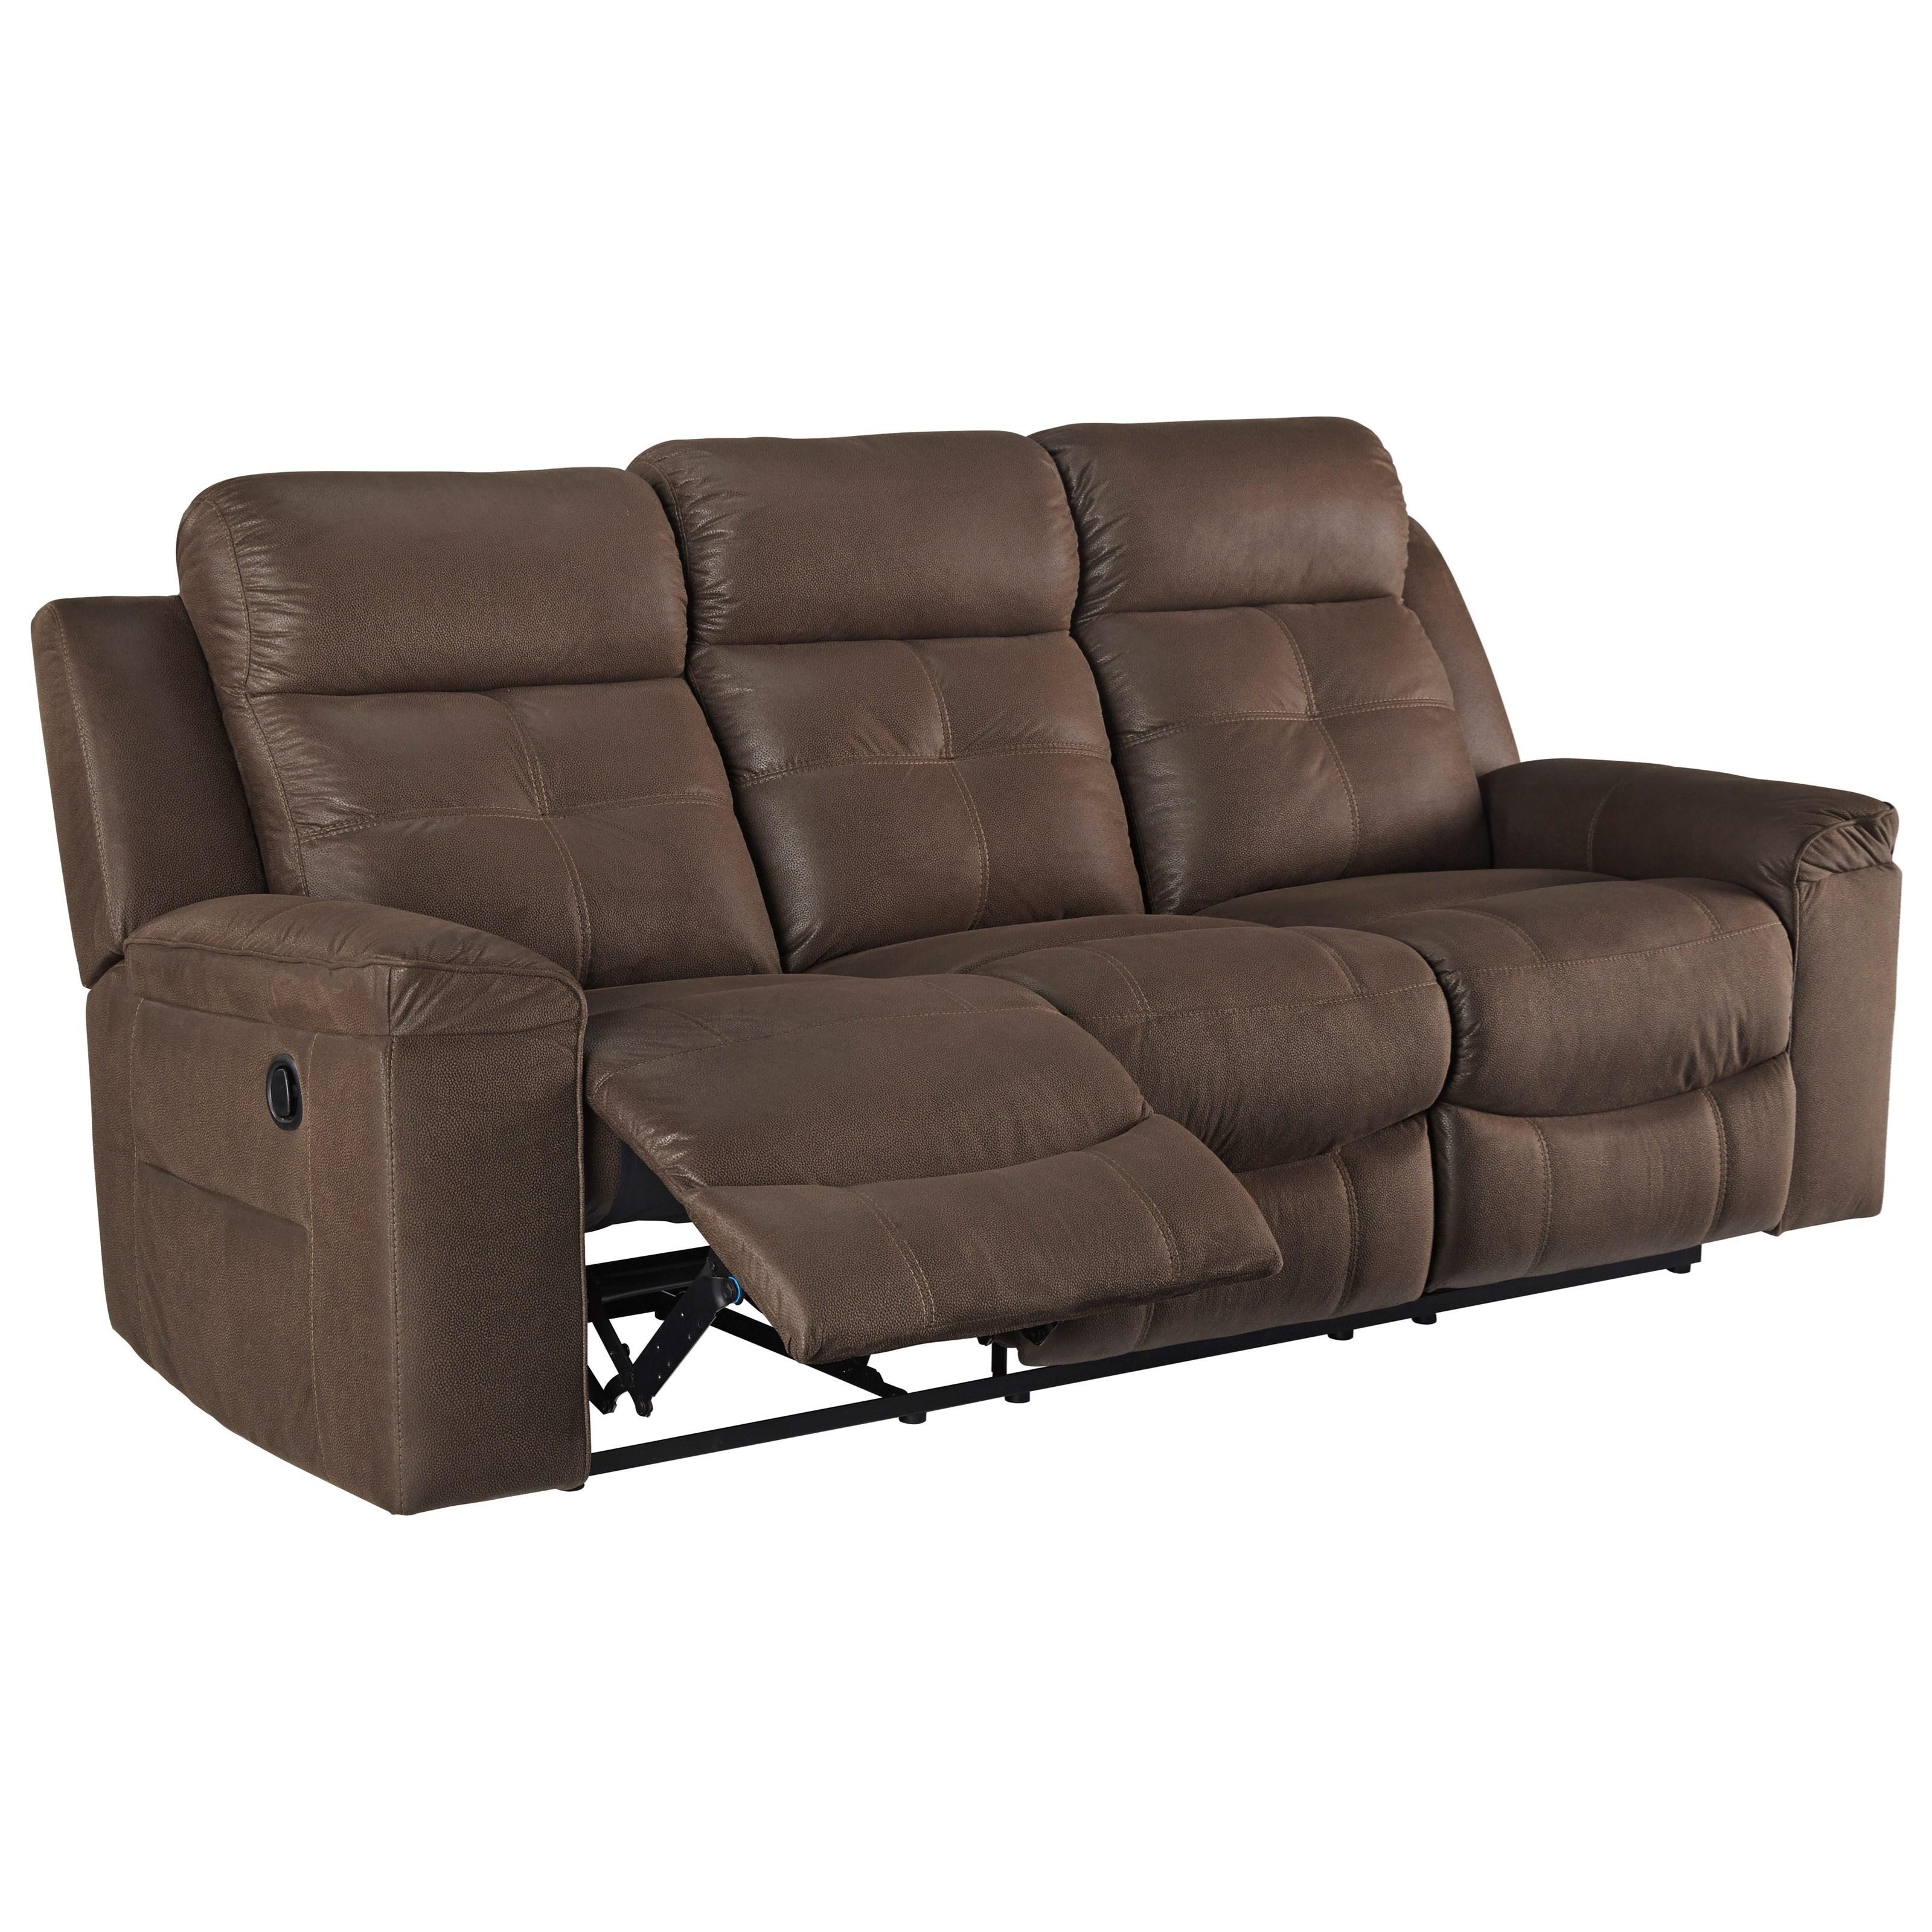 Signature Design Couch: Signature Design By Ashley Jesolo Contemporary Reclining